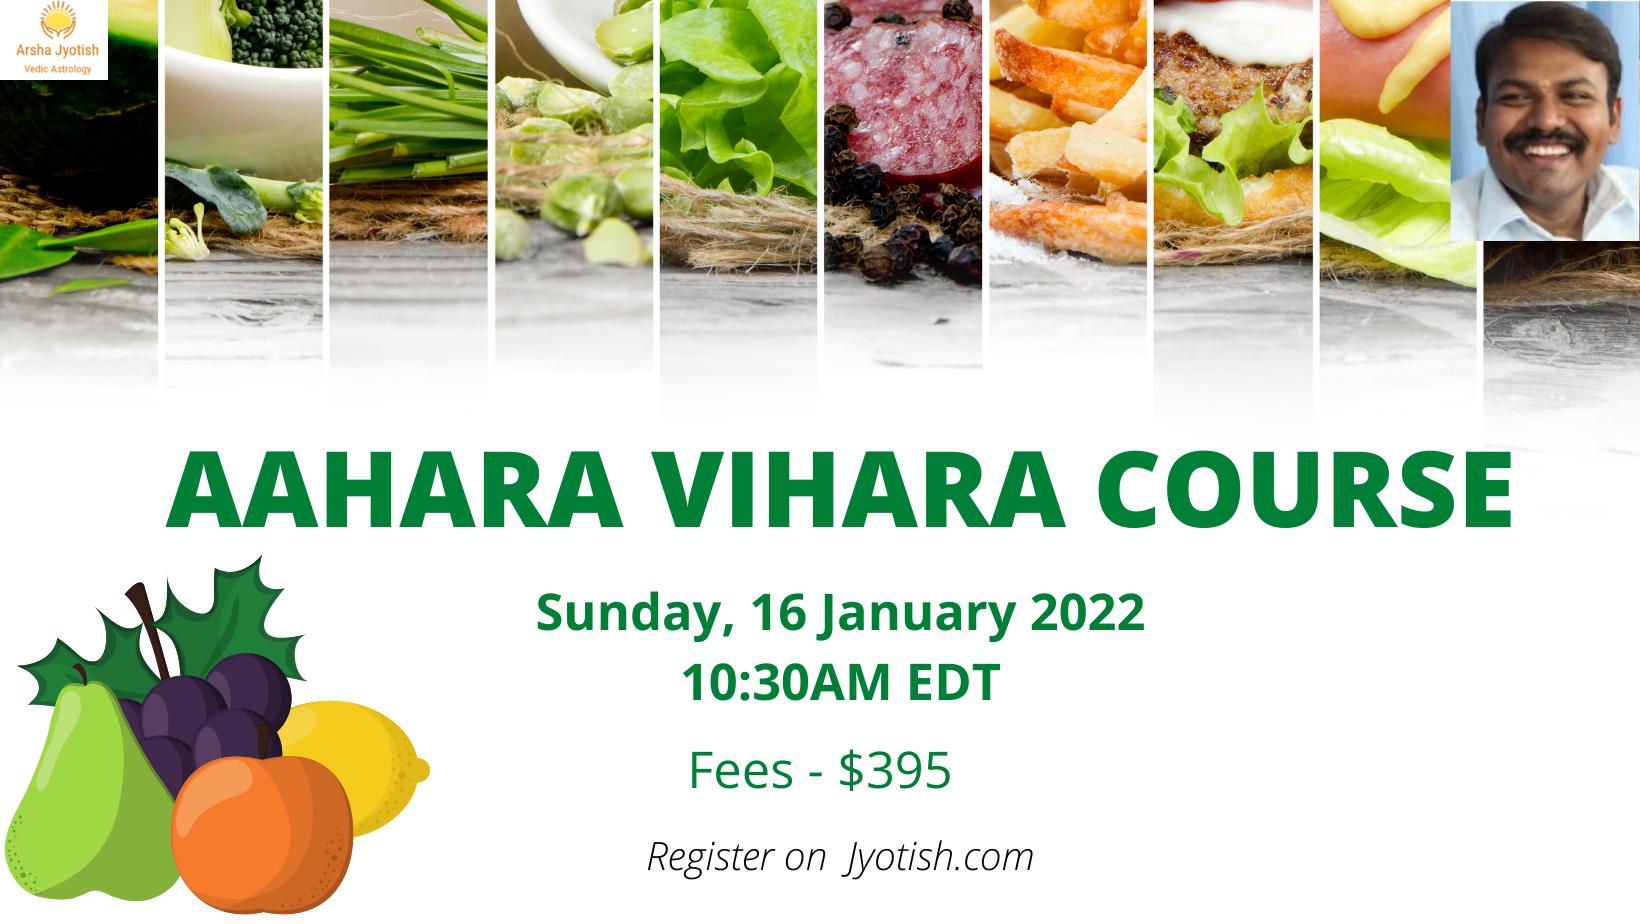 aahara vihara course